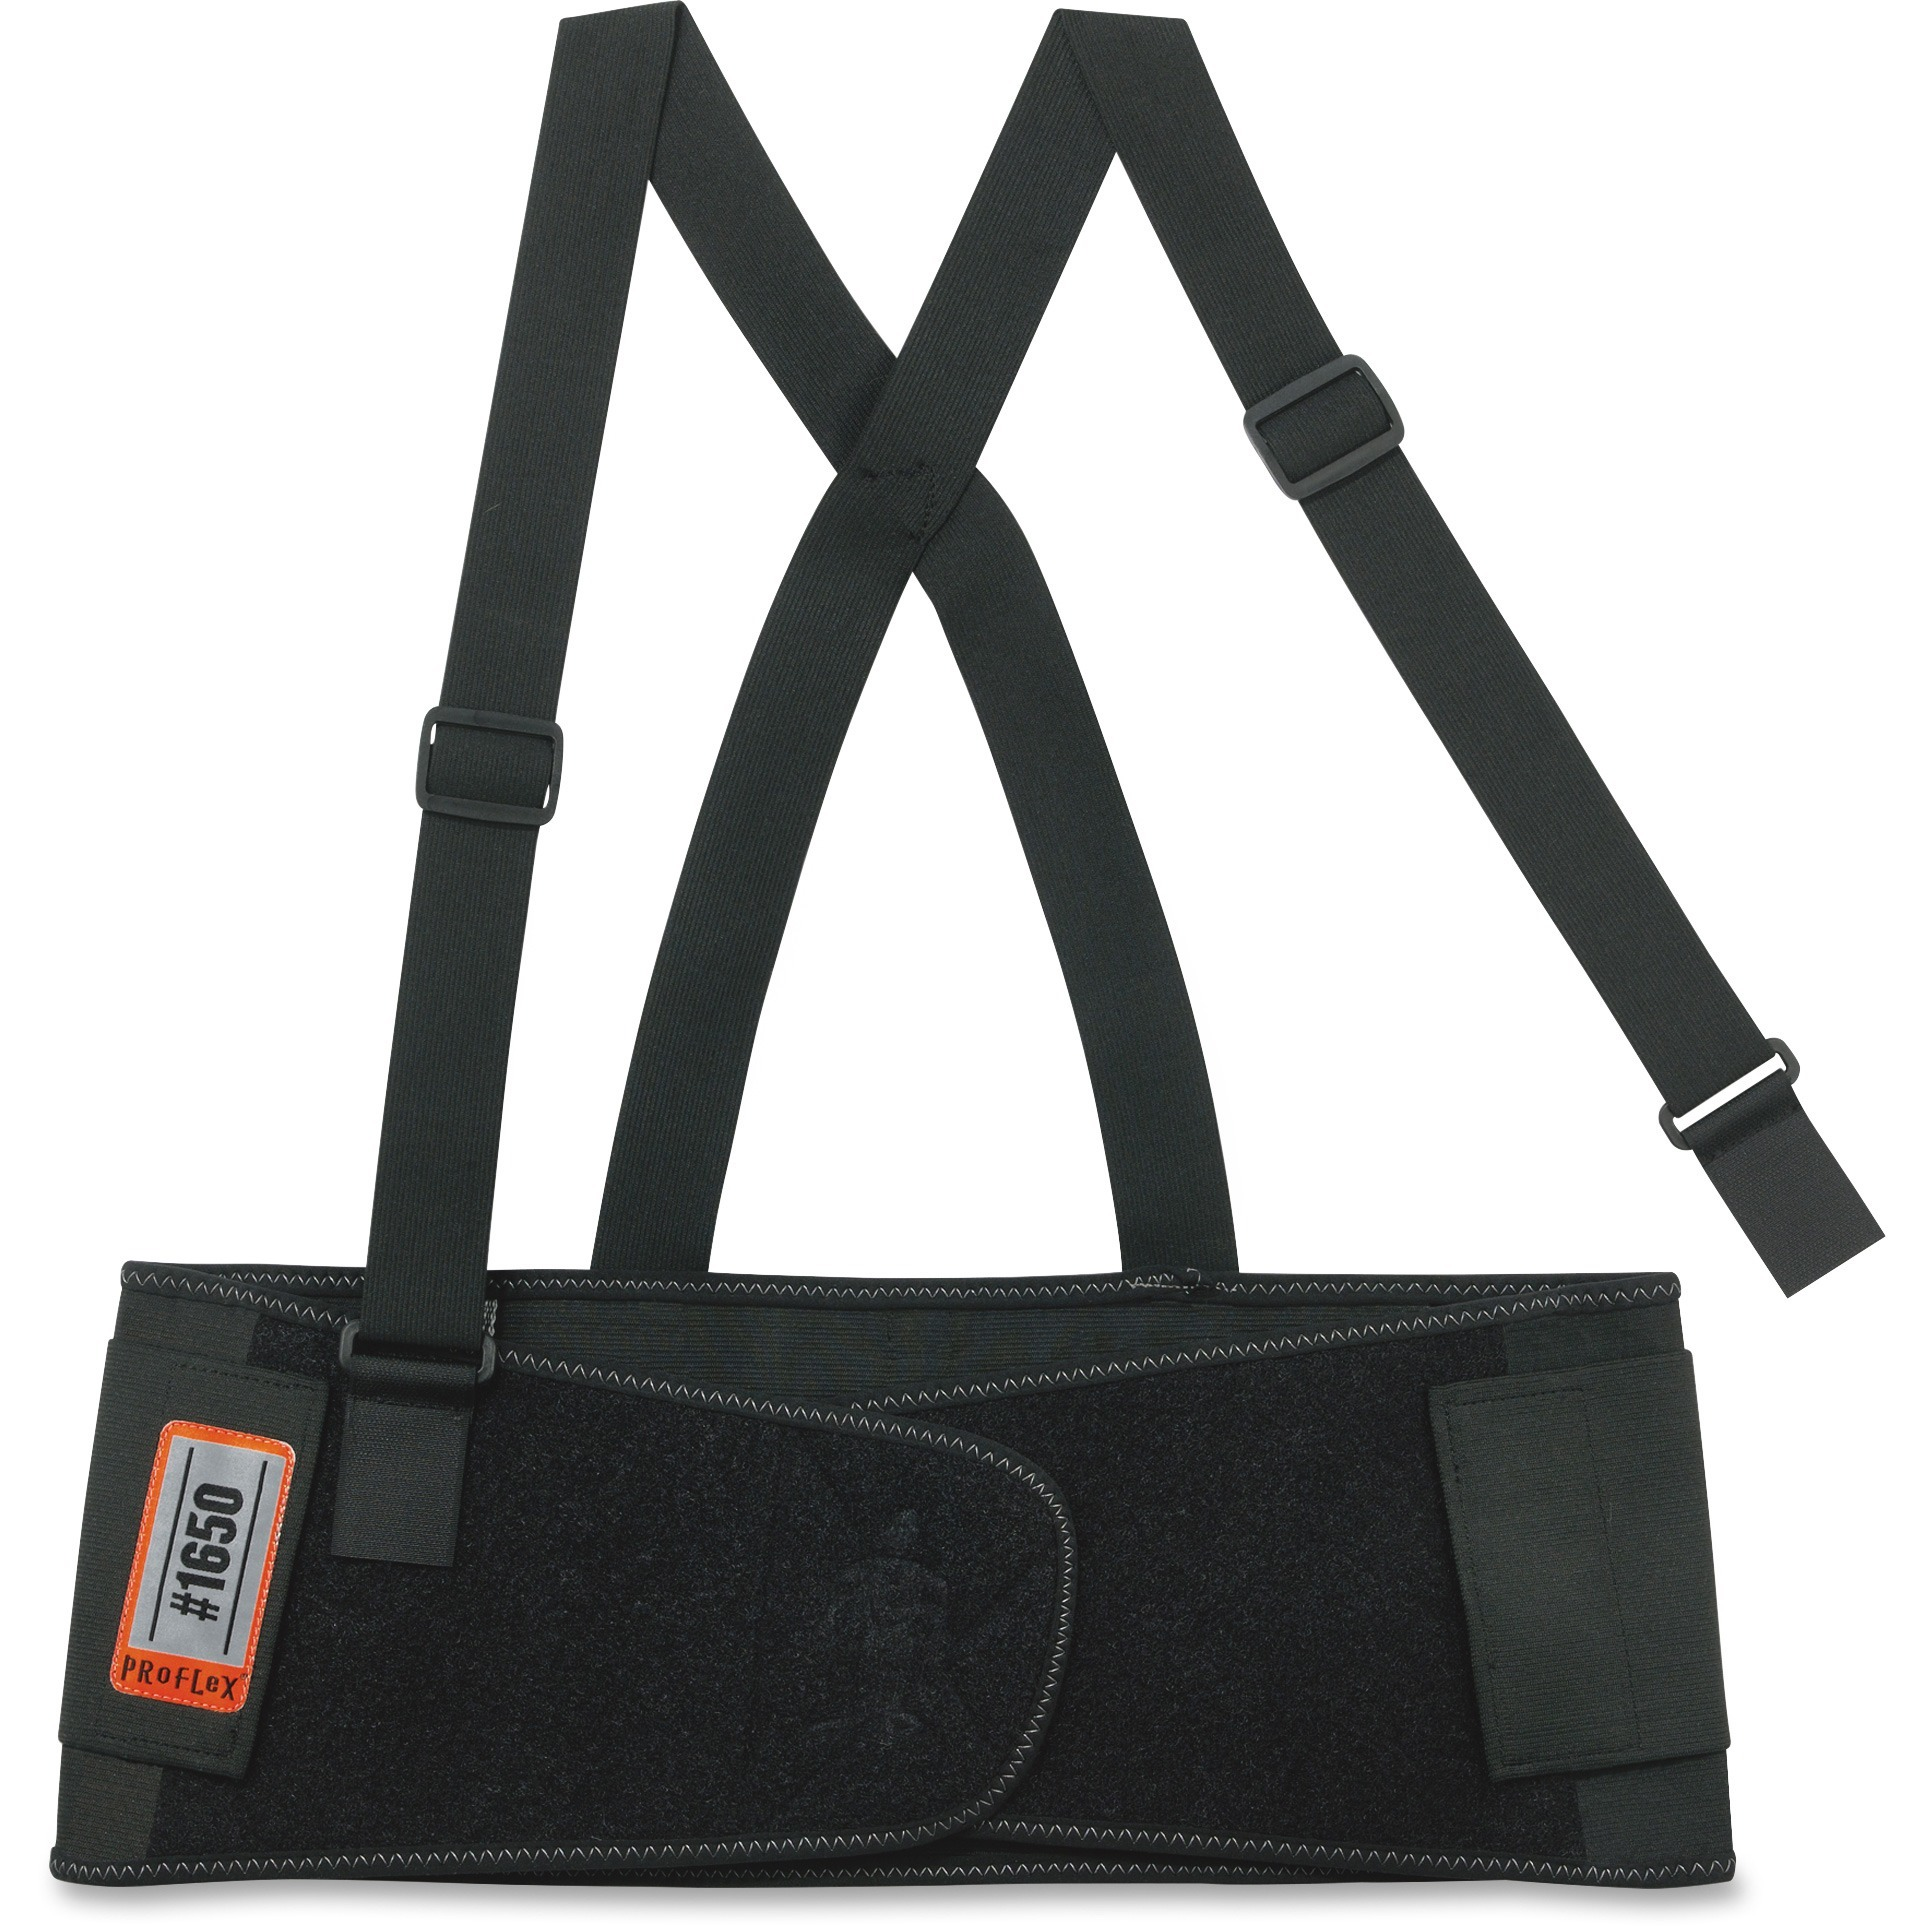 ProFlex, EGO11091, Economy Elastic Back Support, 1 Each, Black